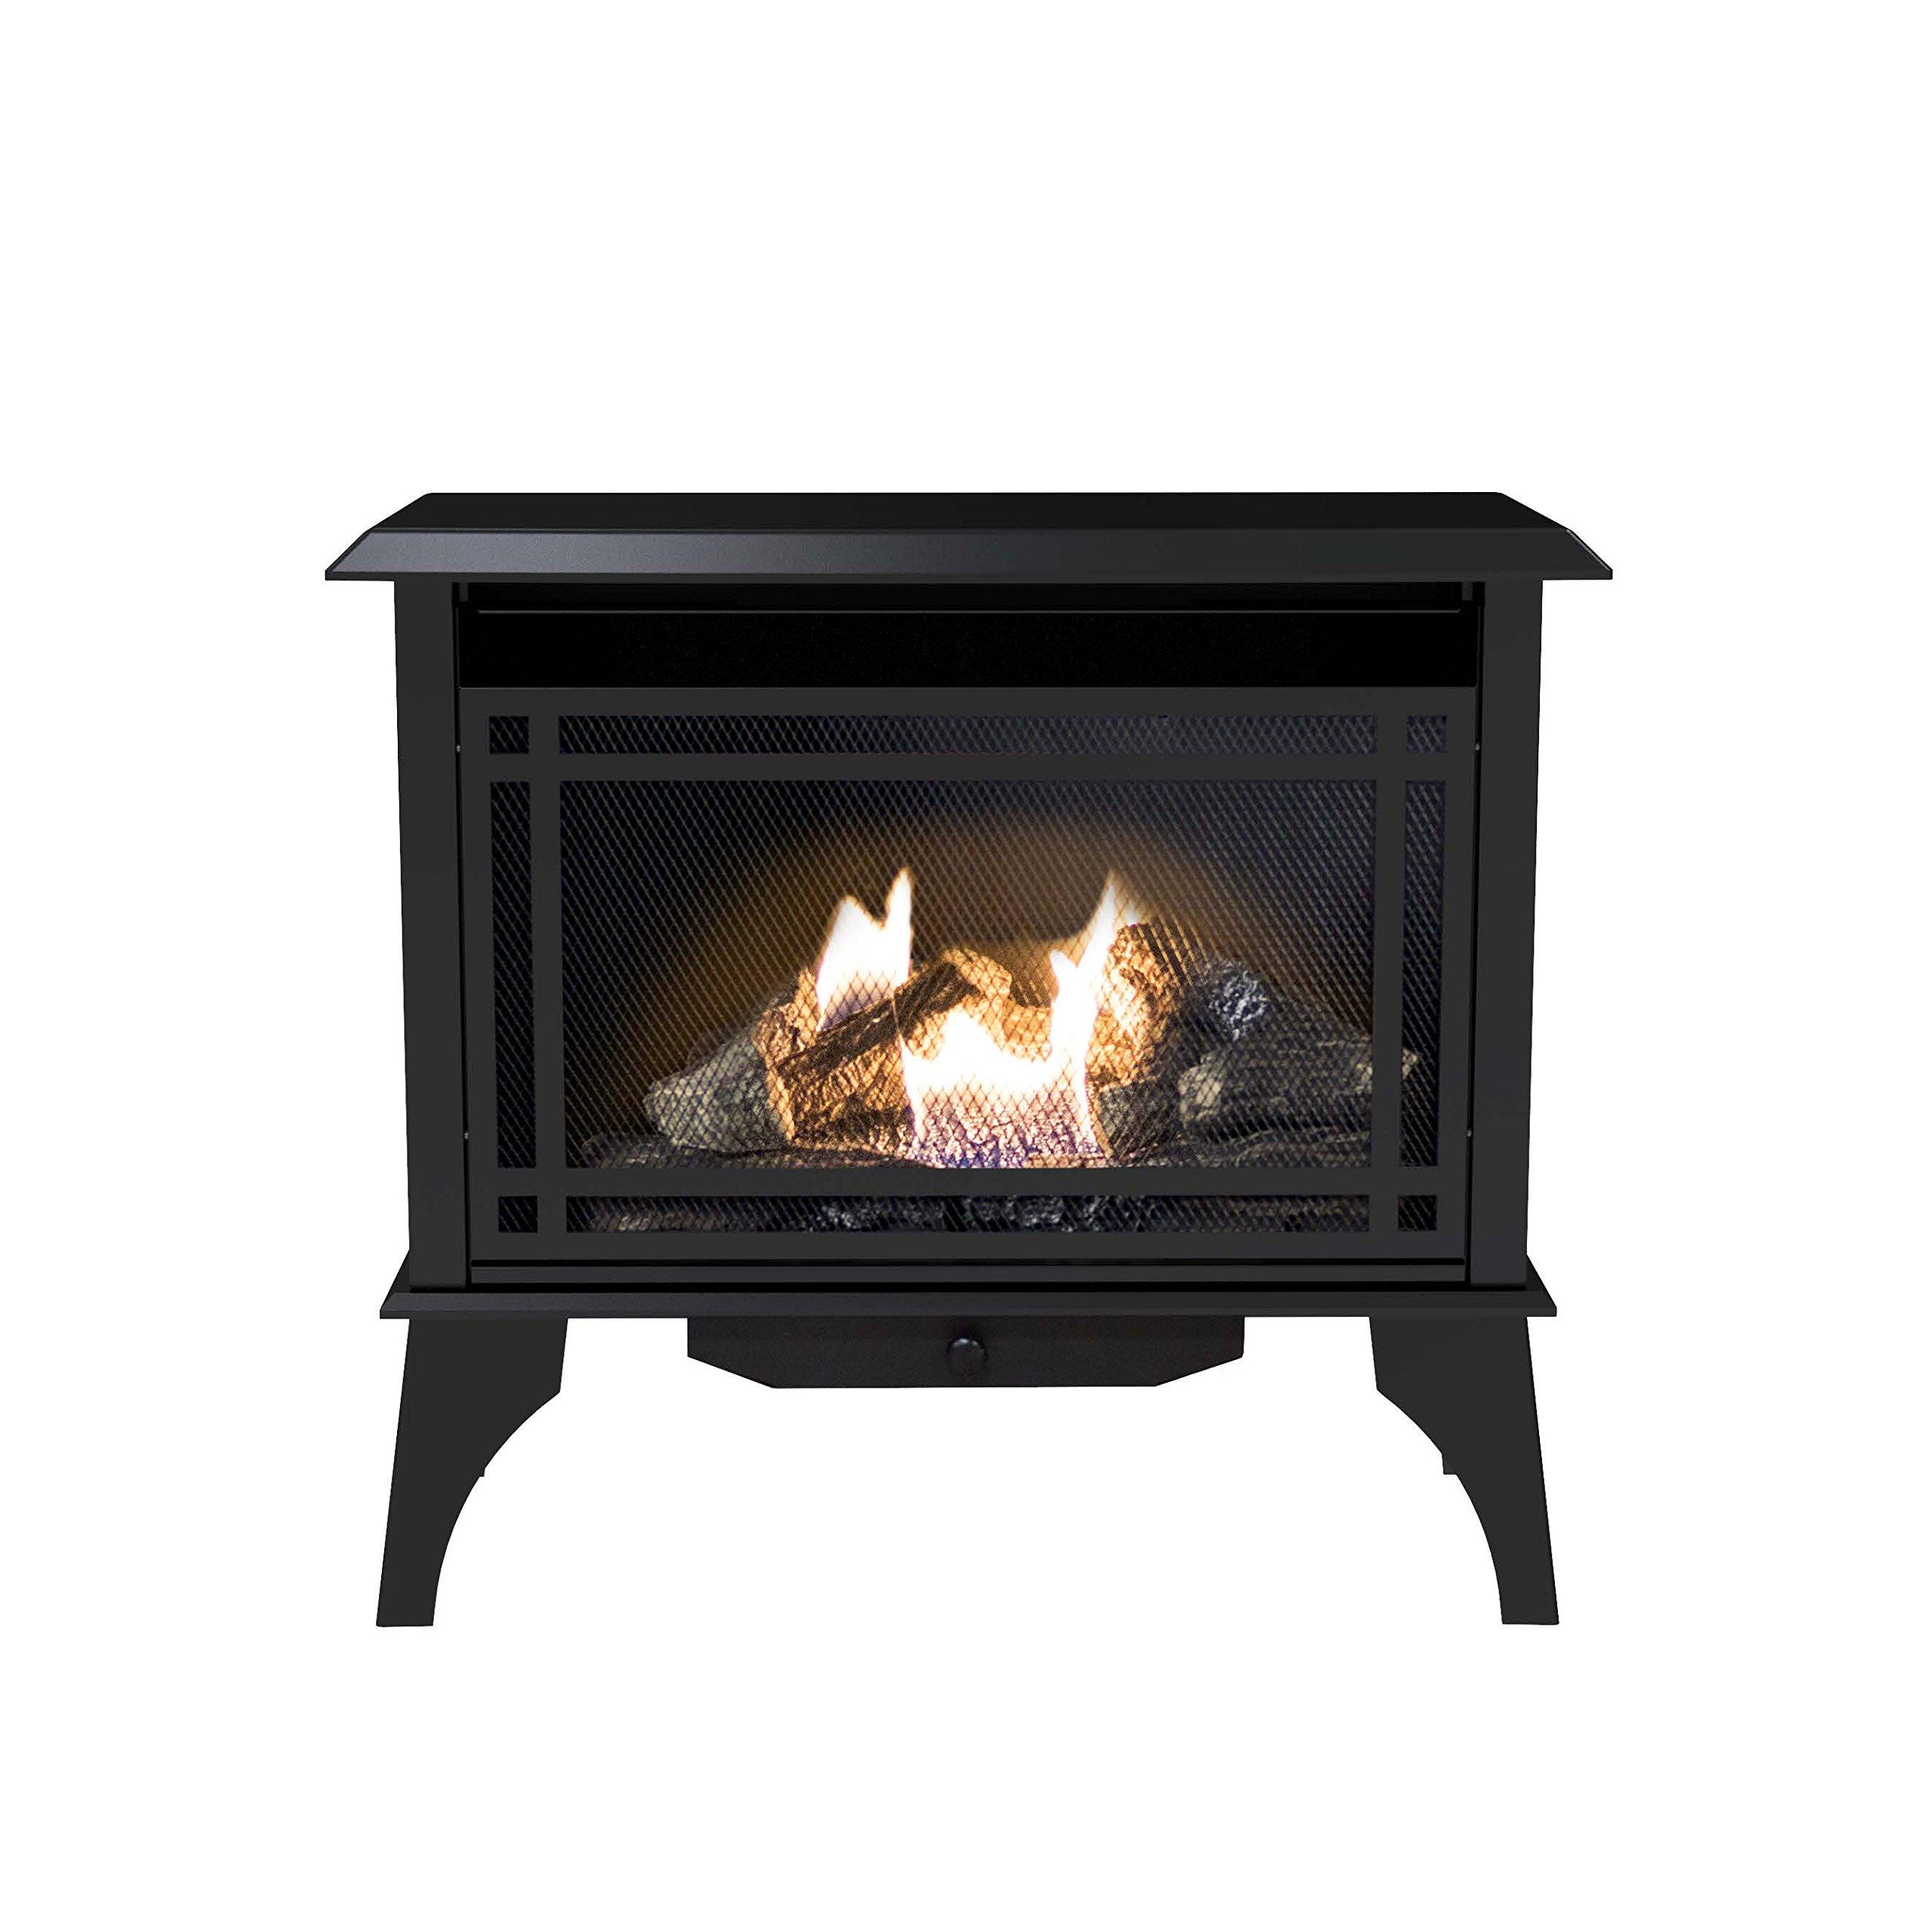 ventless propane fireplace amazon com rh amazon com ventless propane fireplaces and stoves propane fireplaces ventless safety